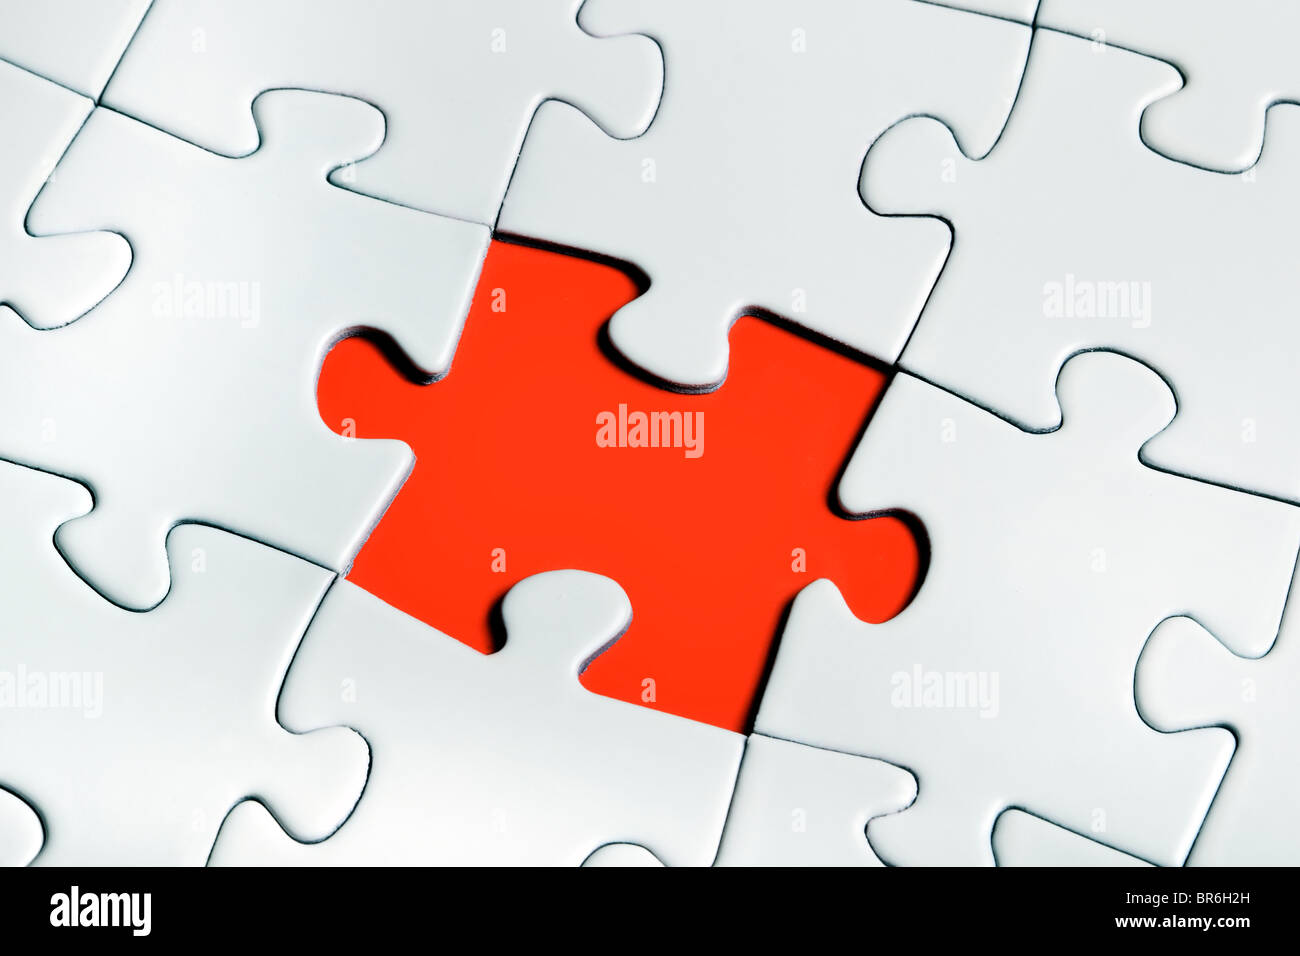 puzzle pieces - Stock Image